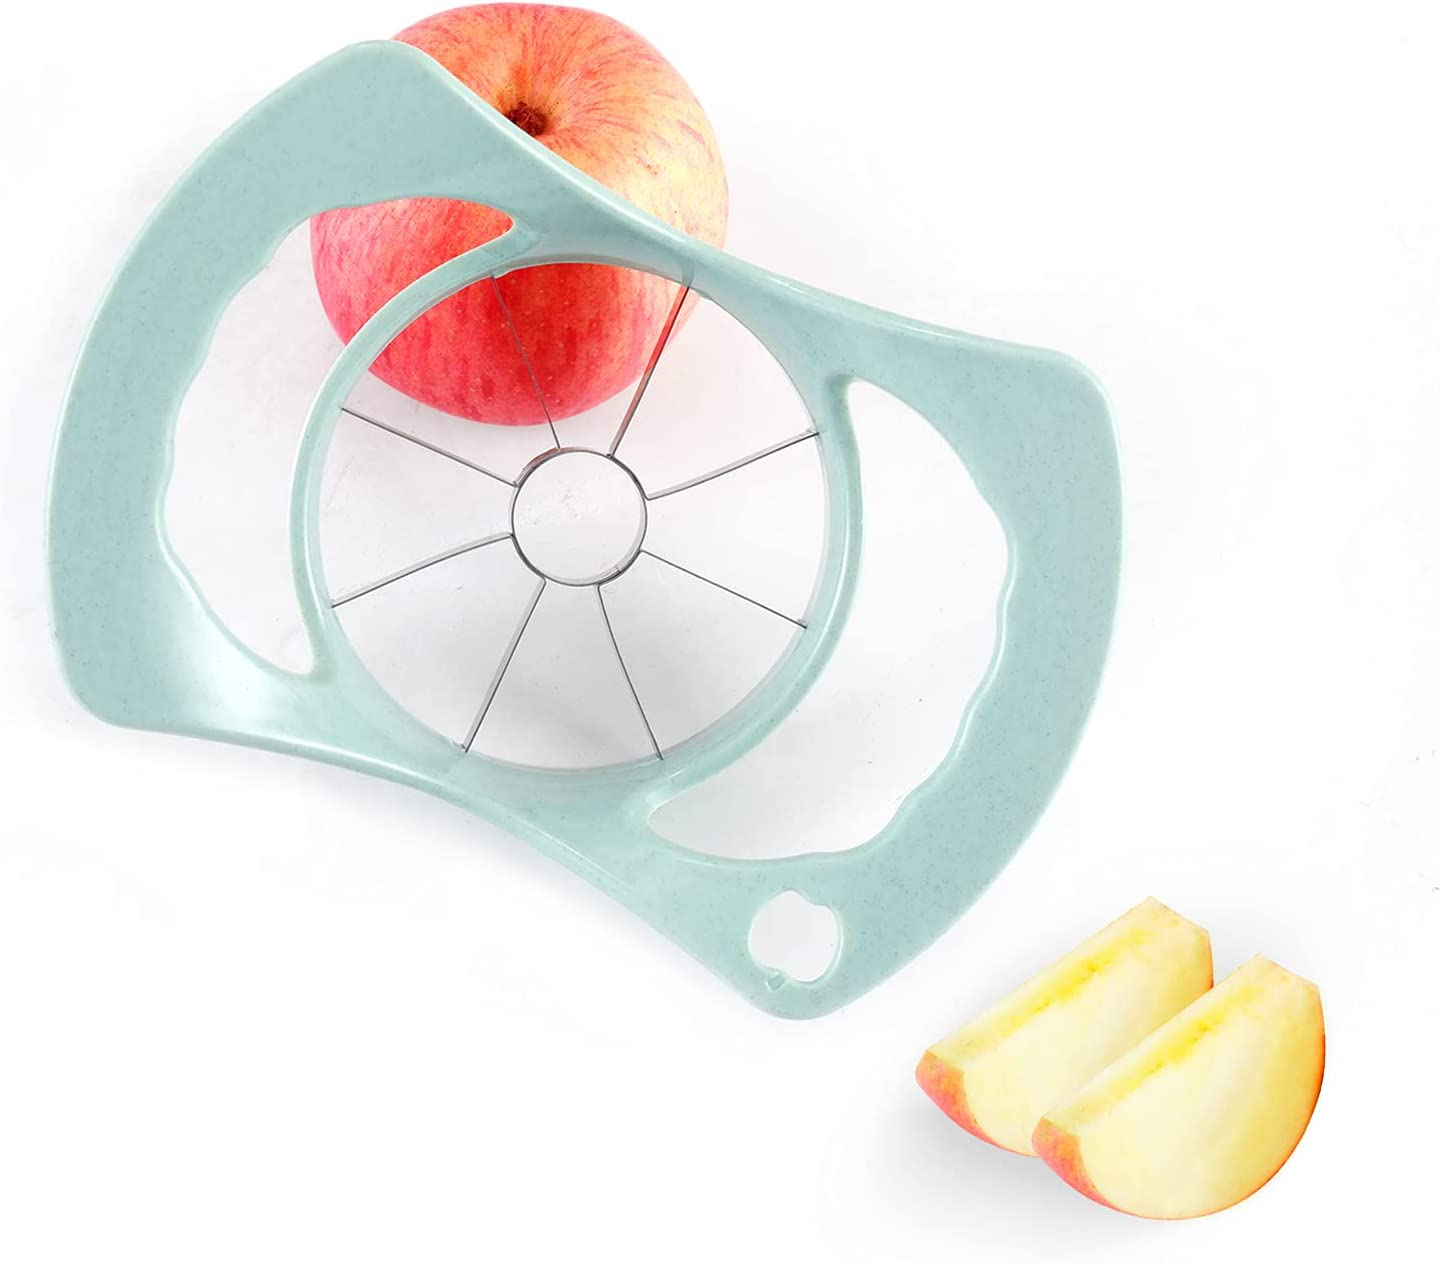 Premium 8 blade Apple Cutter, Easy Grip Apple Slicer and Corer, Kitchen Fruit Slicer Tool